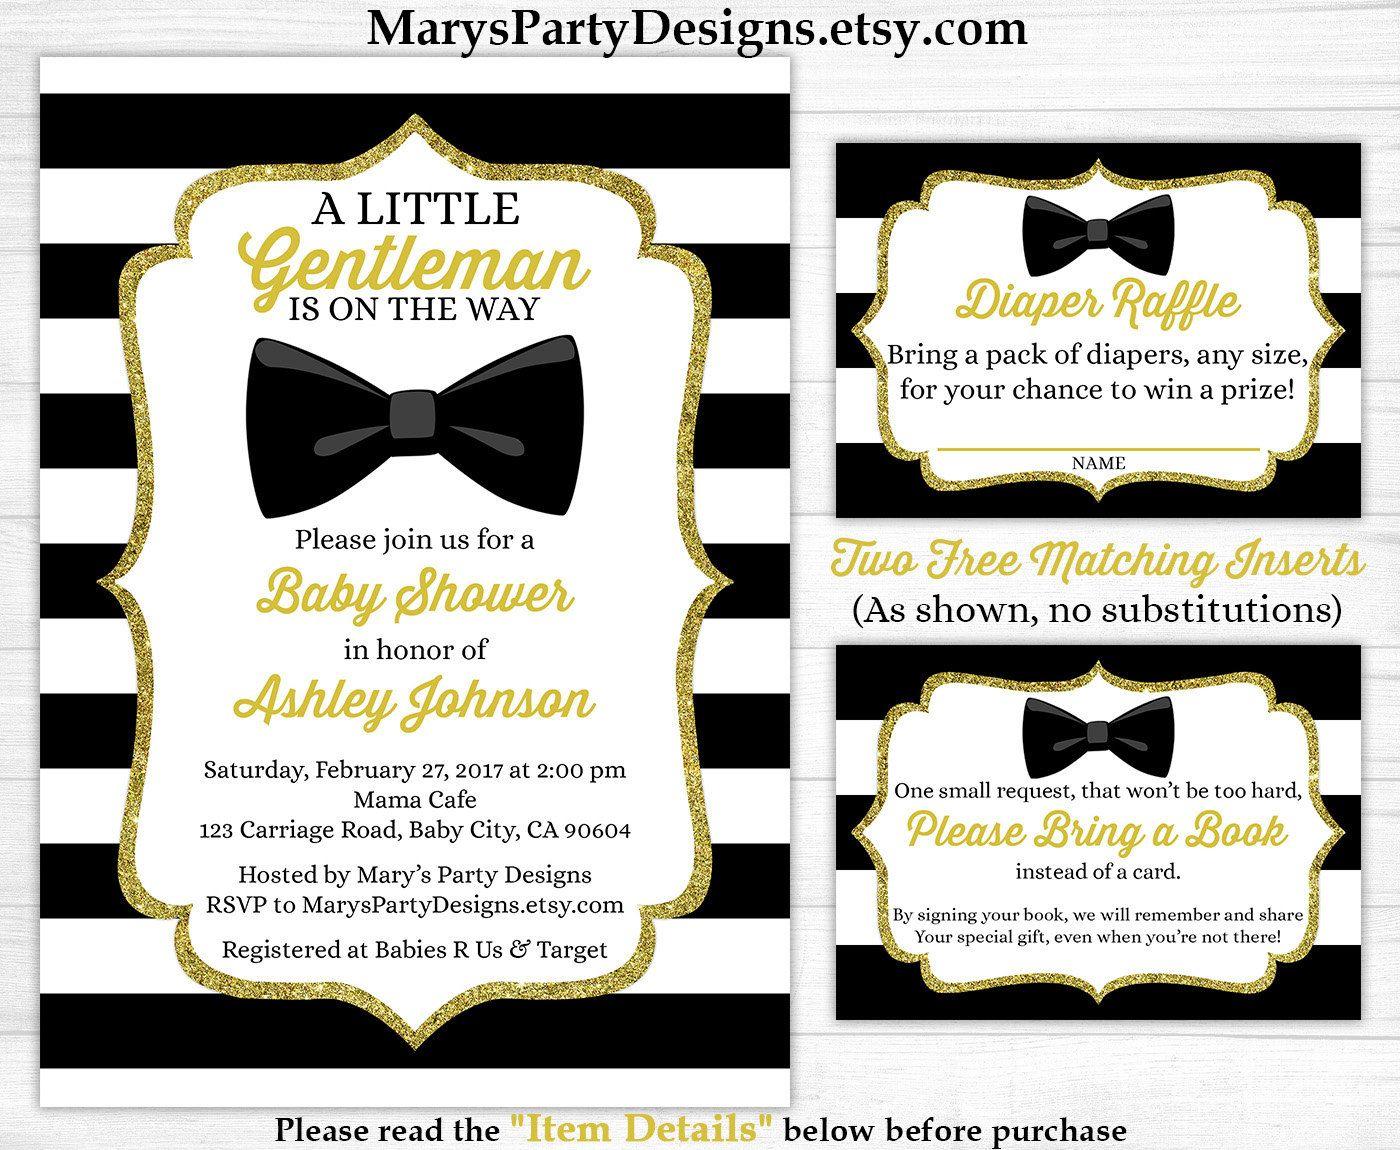 Little Gentleman Baby Shower Invitation - Boy Gold Black White - Free Printable Black And White Baby Shower Invitations